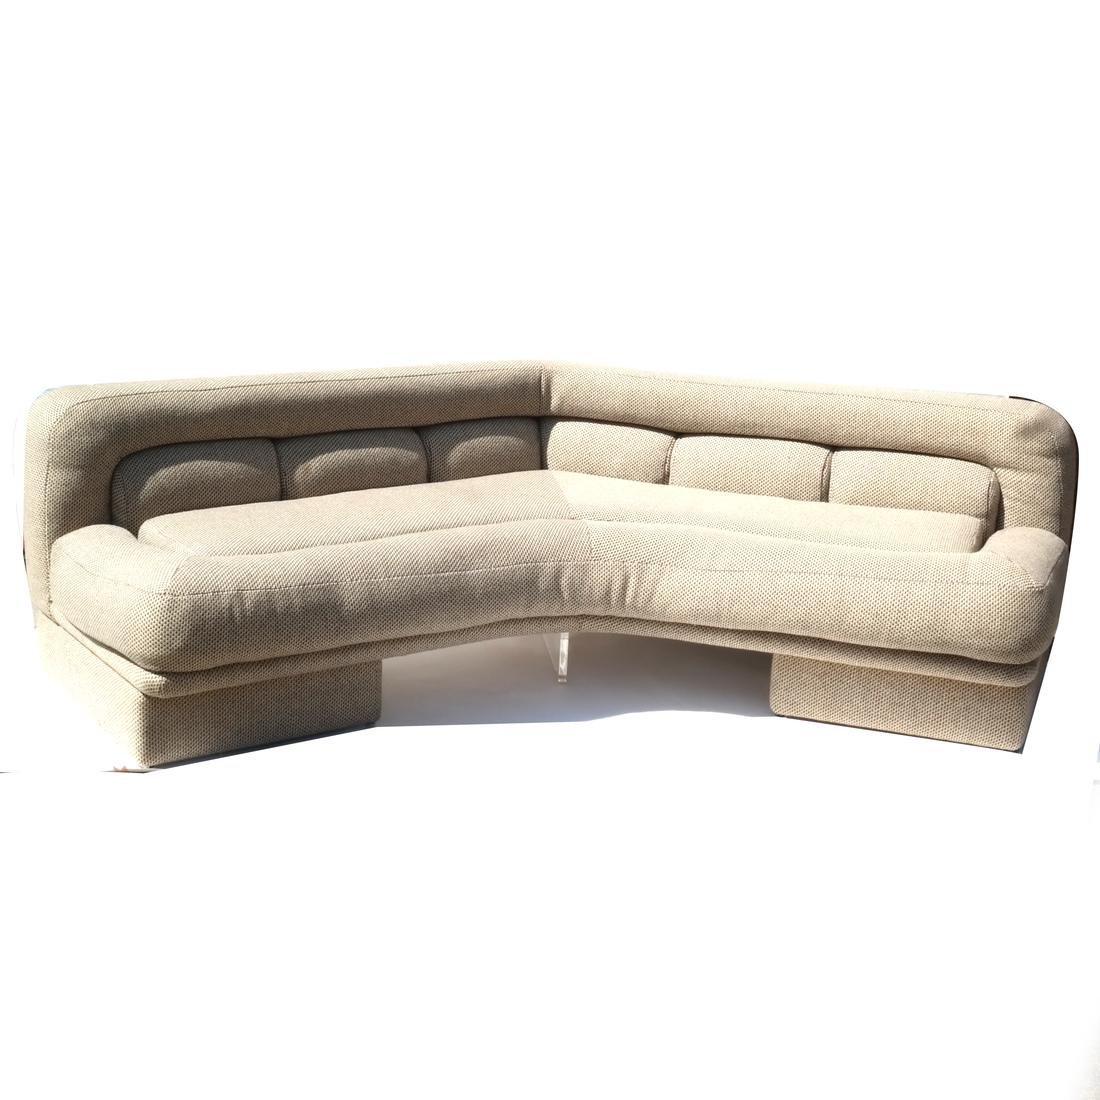 Vladimir Kagan Designed Boomerang Sofa